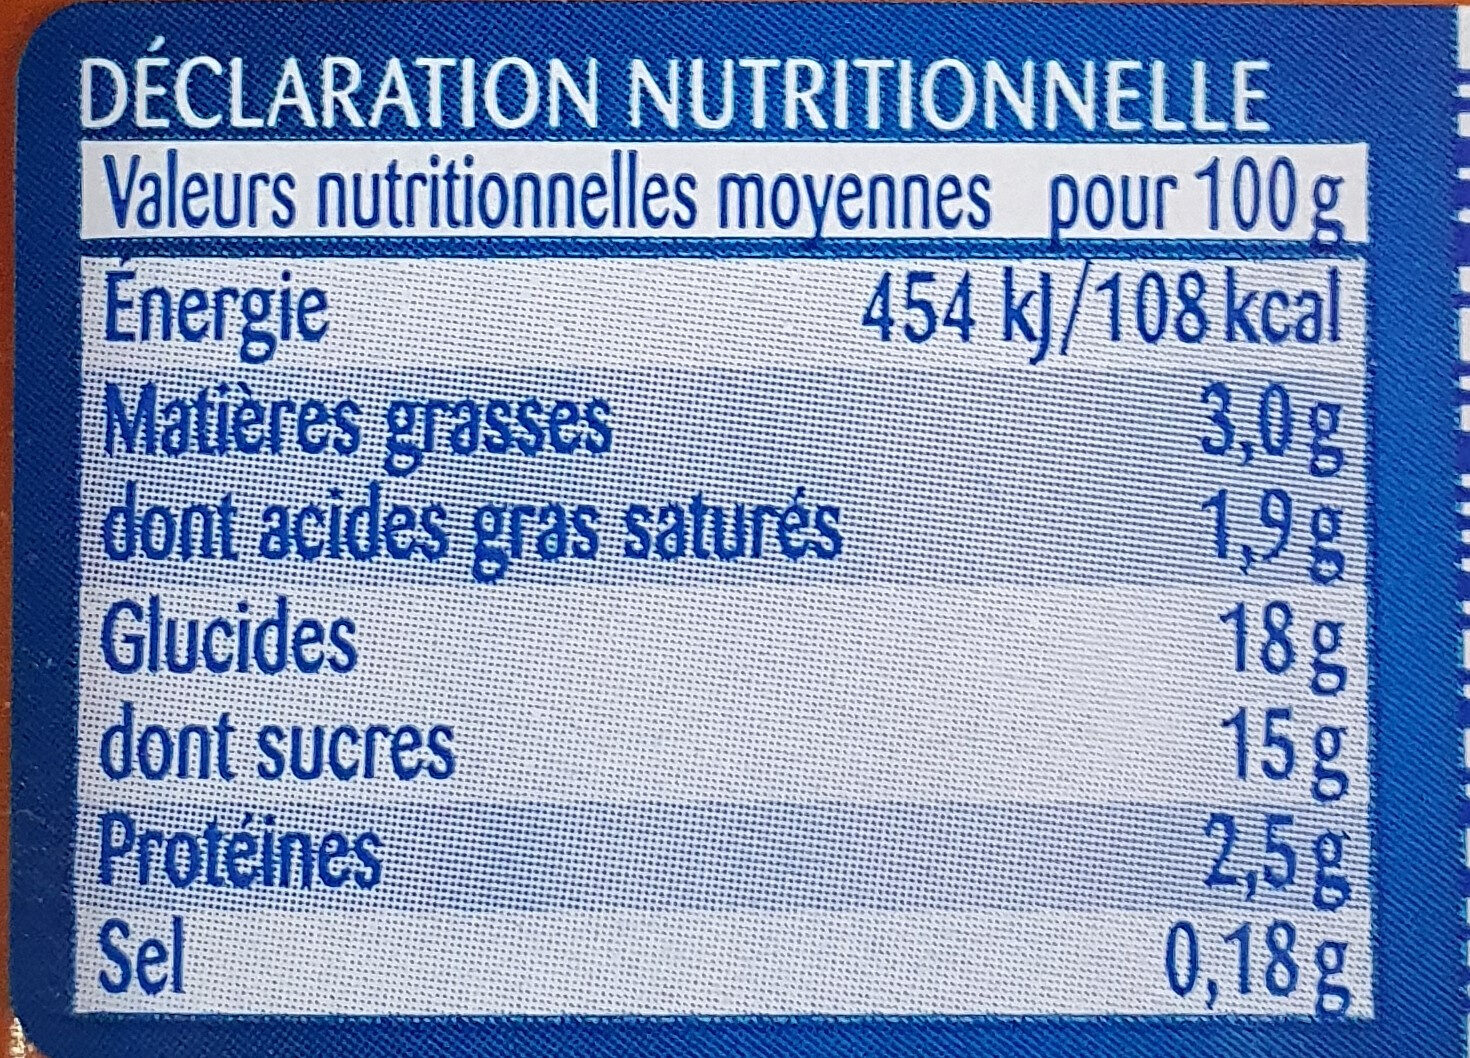 Crème dessert Caramel - Informations nutritionnelles - fr